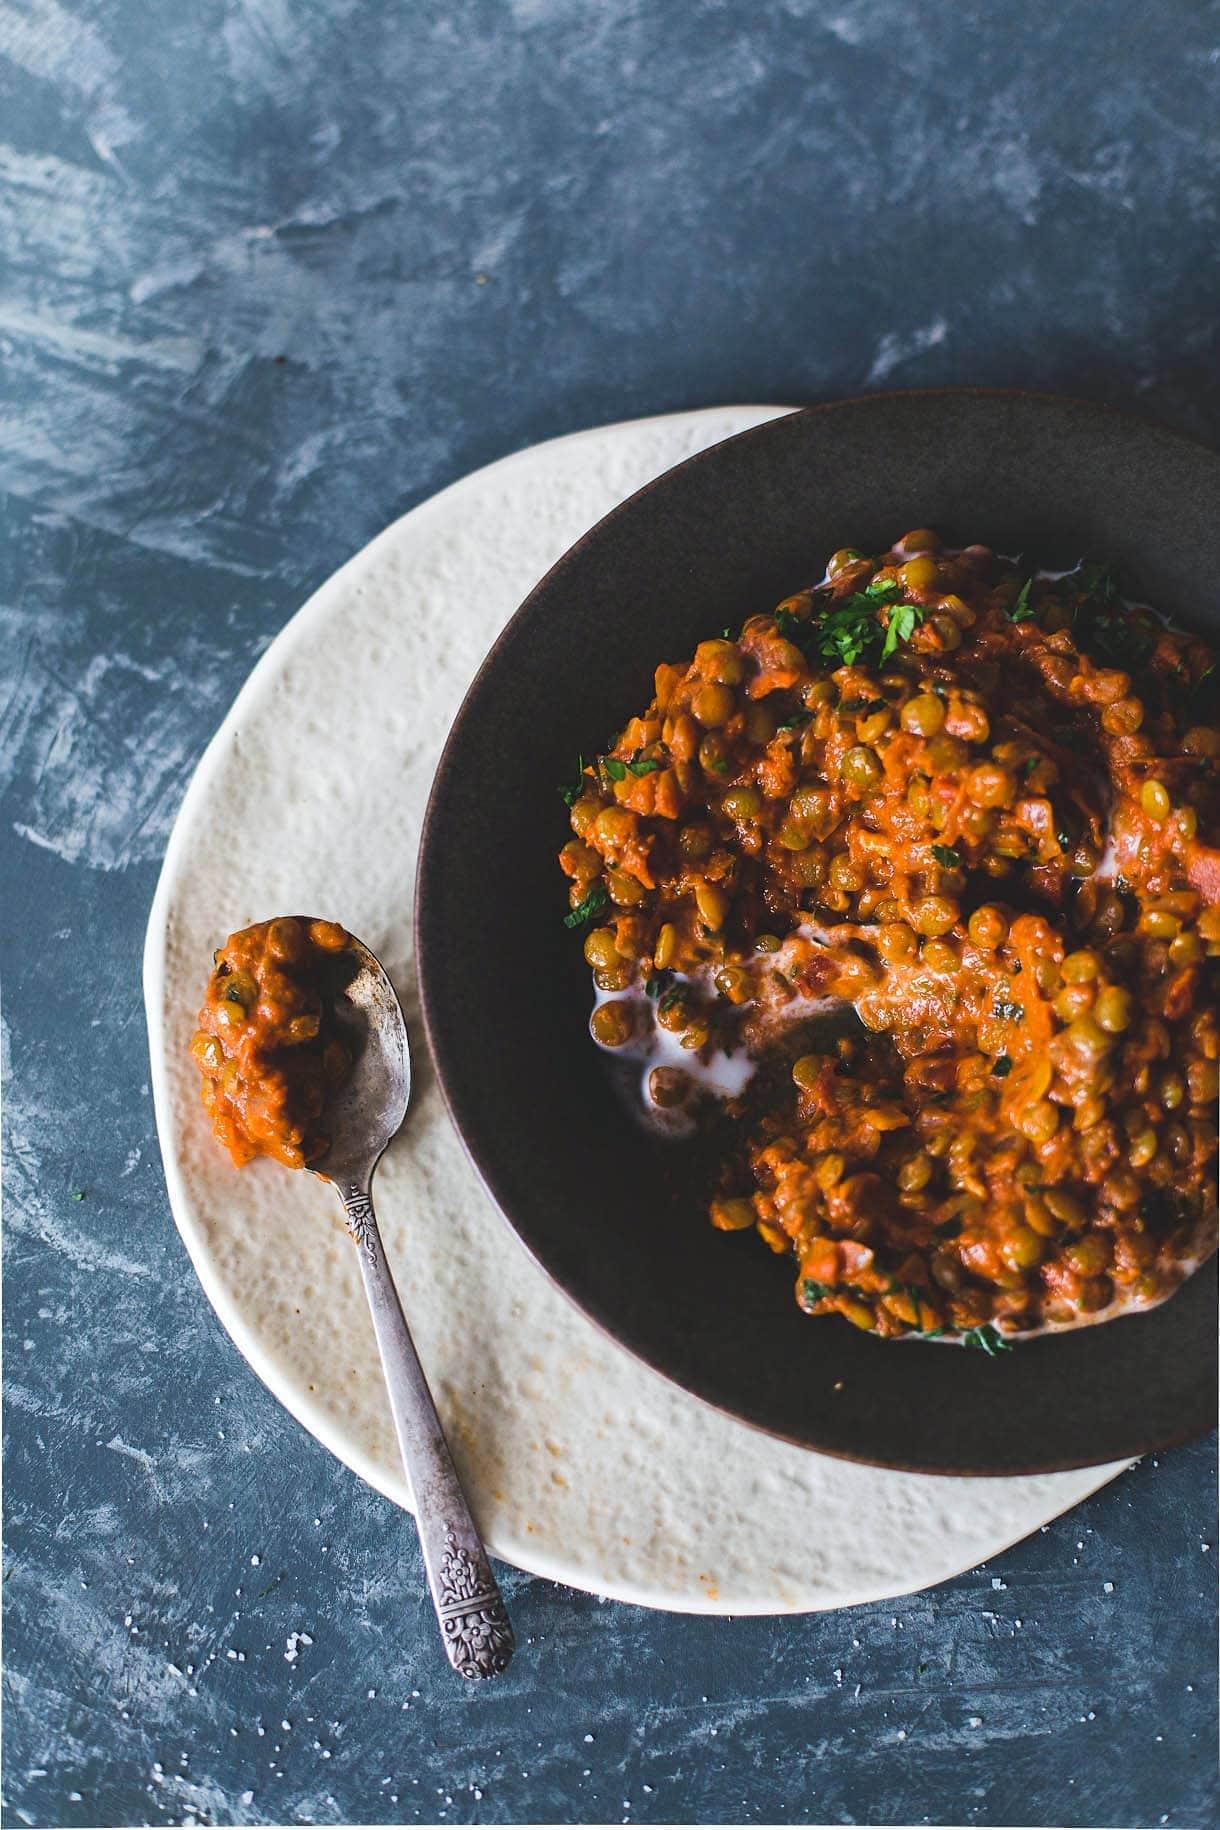 muir-glen-lentils-7